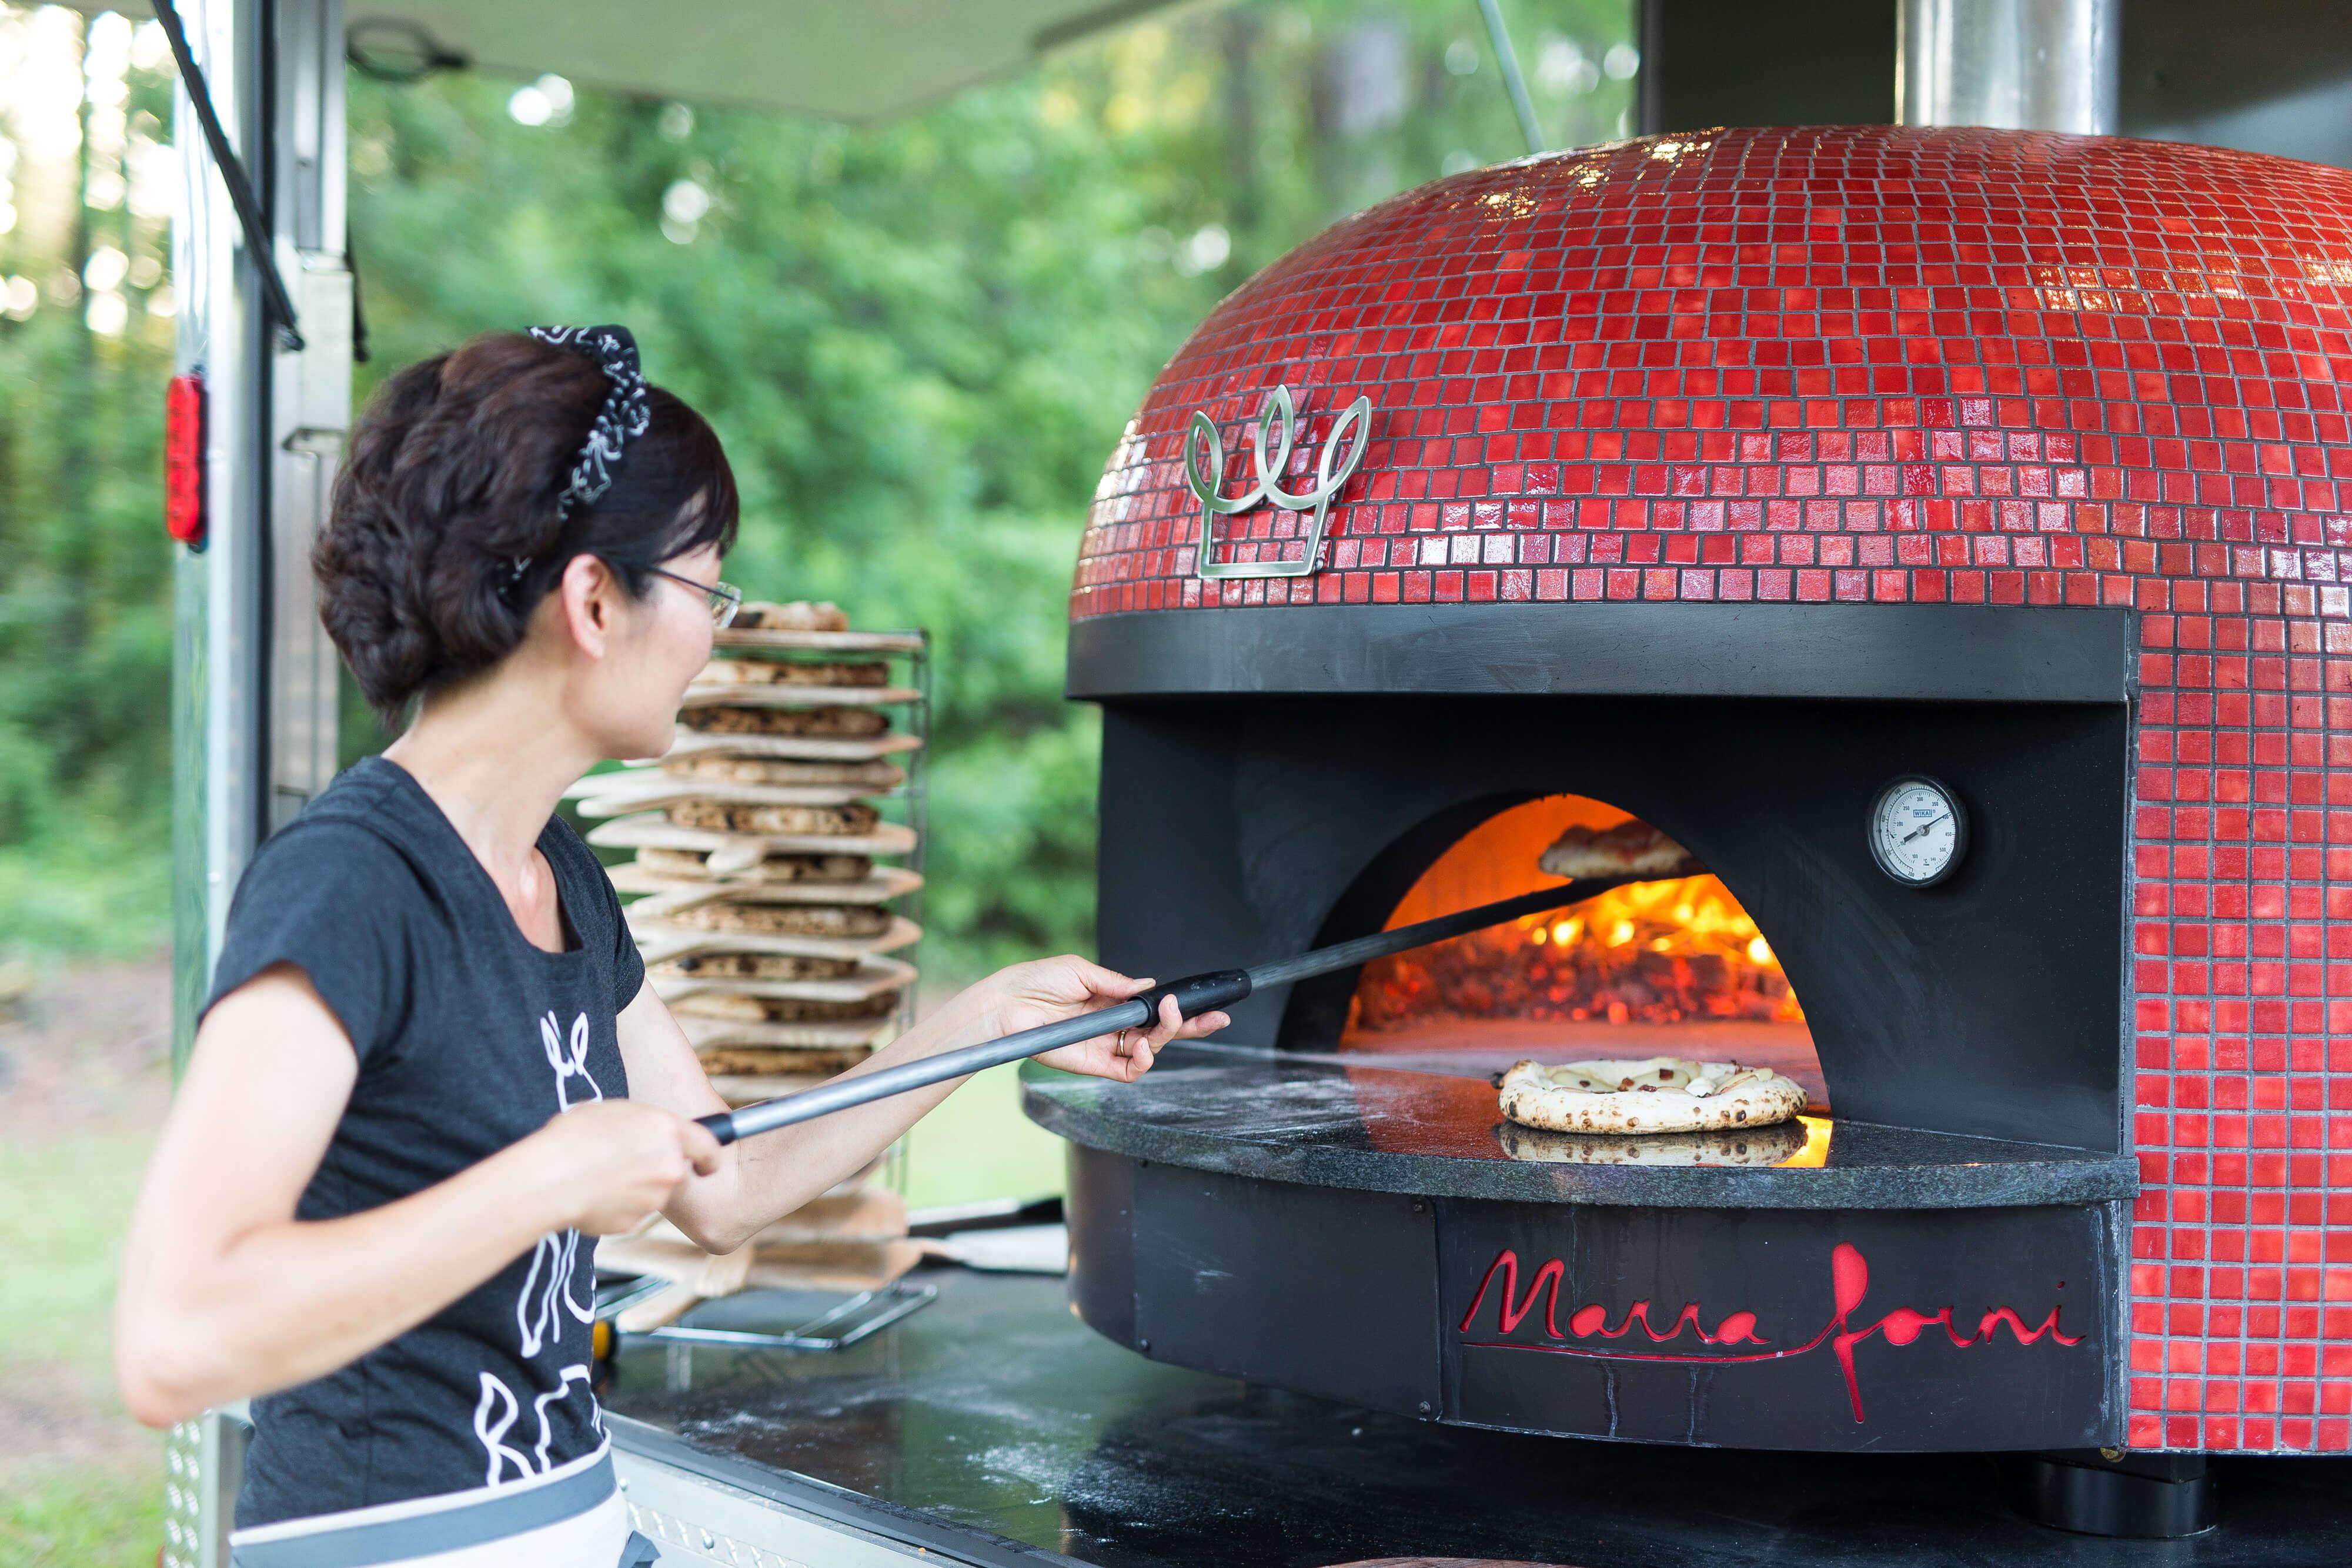 Marra Forni Authentic American Engineered Italian Brick Ovens